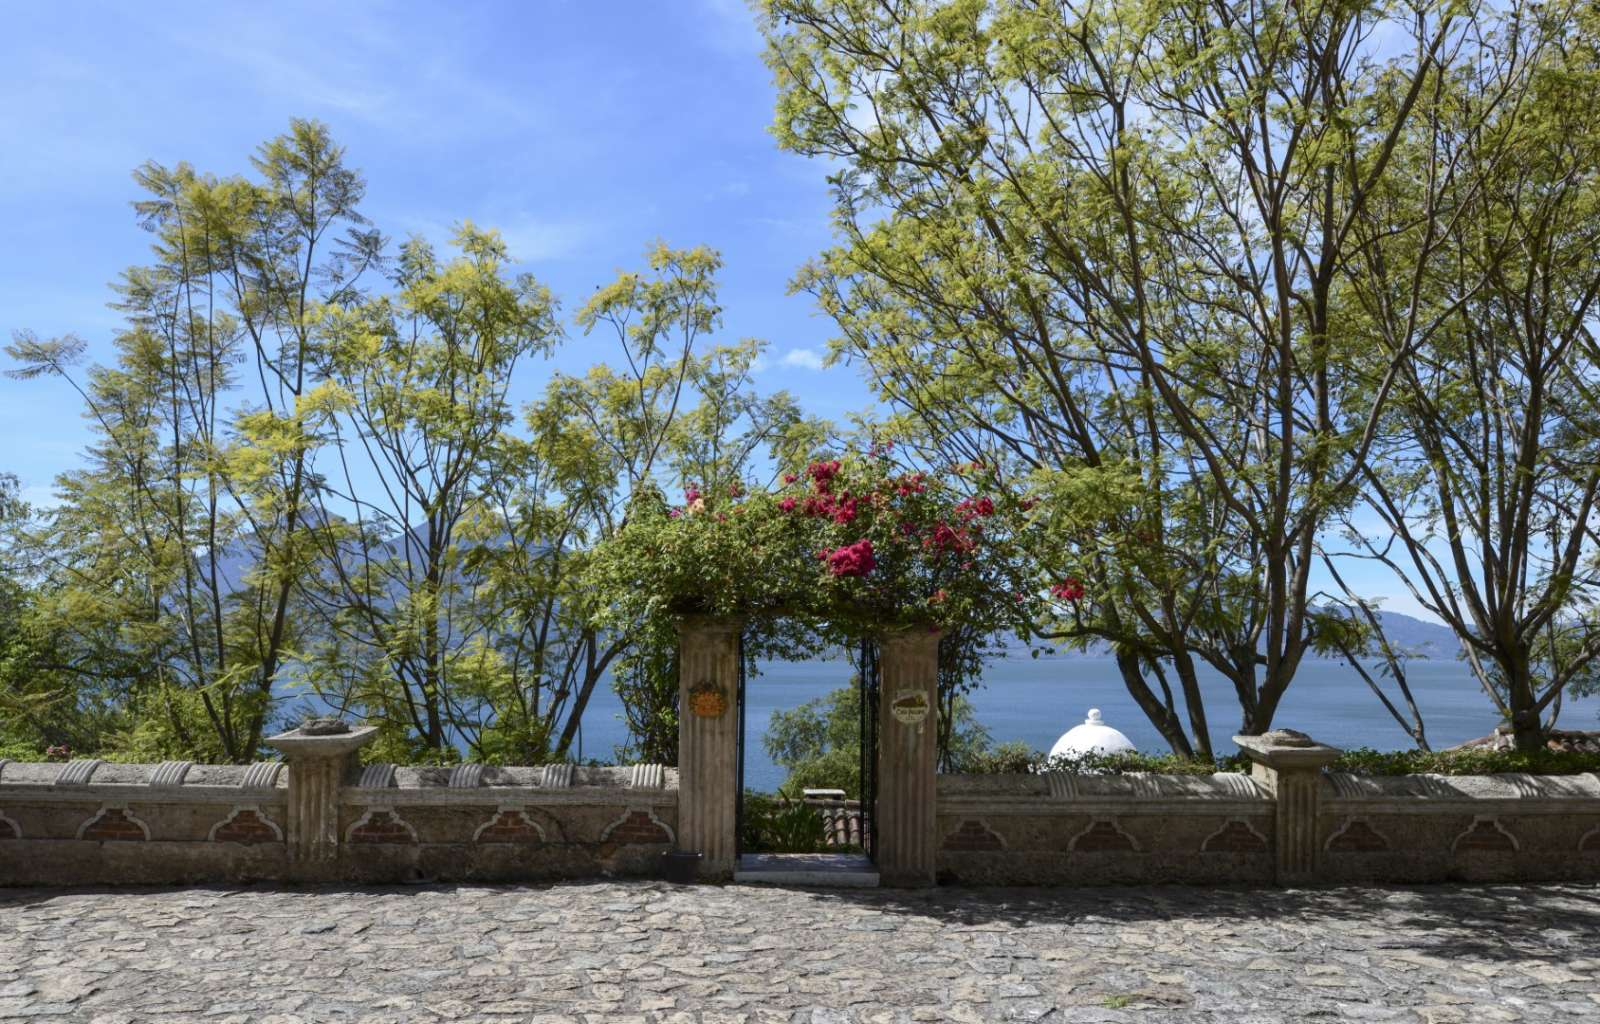 Entrance to Casa Palopo in Lake Atitlan